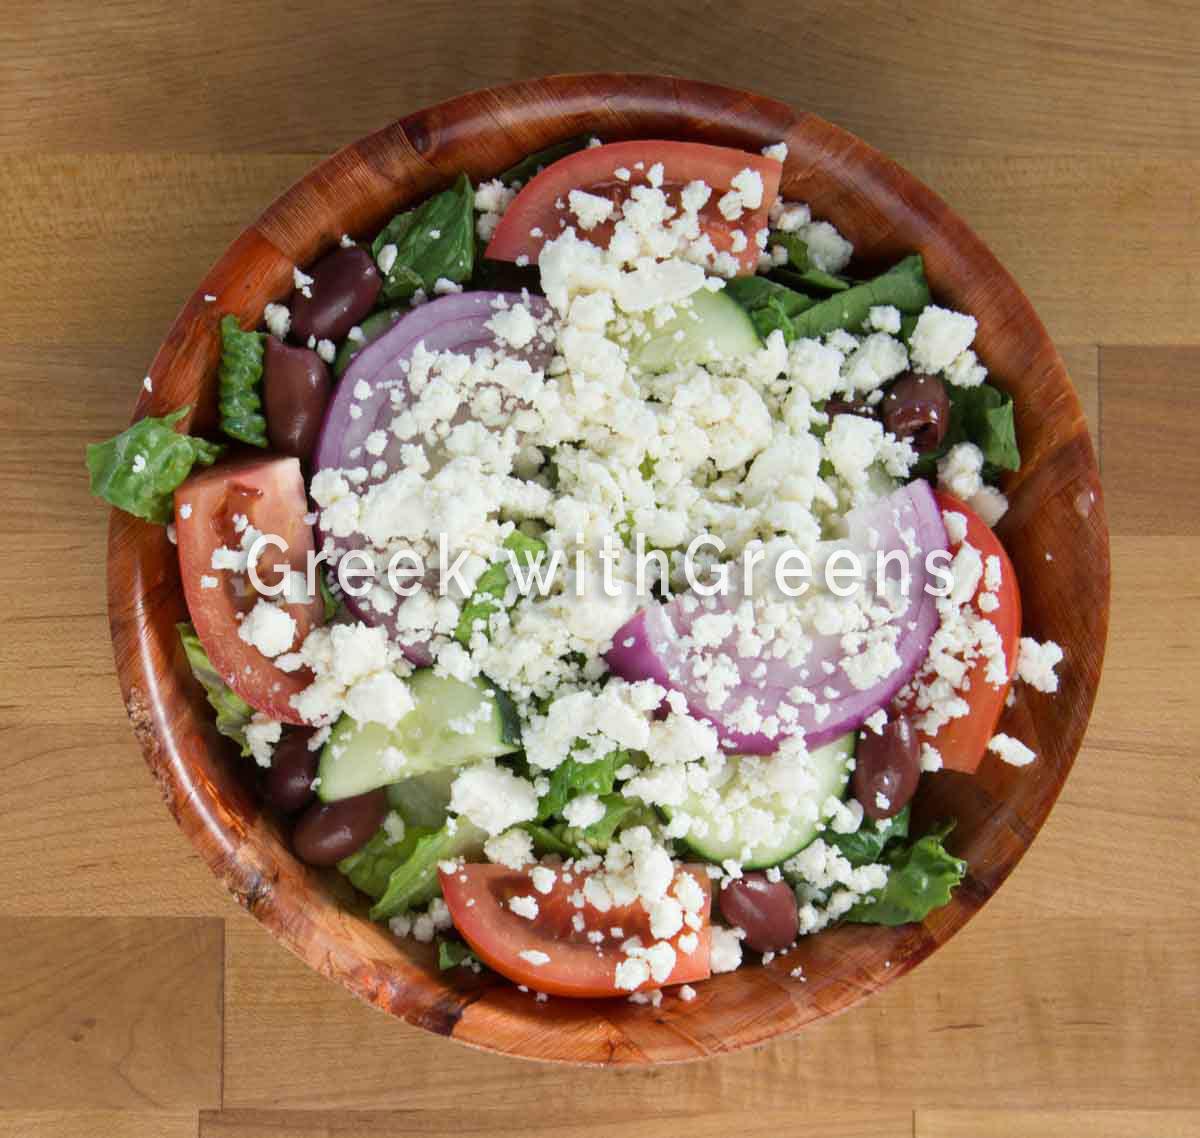 FamousPizza_SideItems_1200px_GreekwGreensSalad.jpg